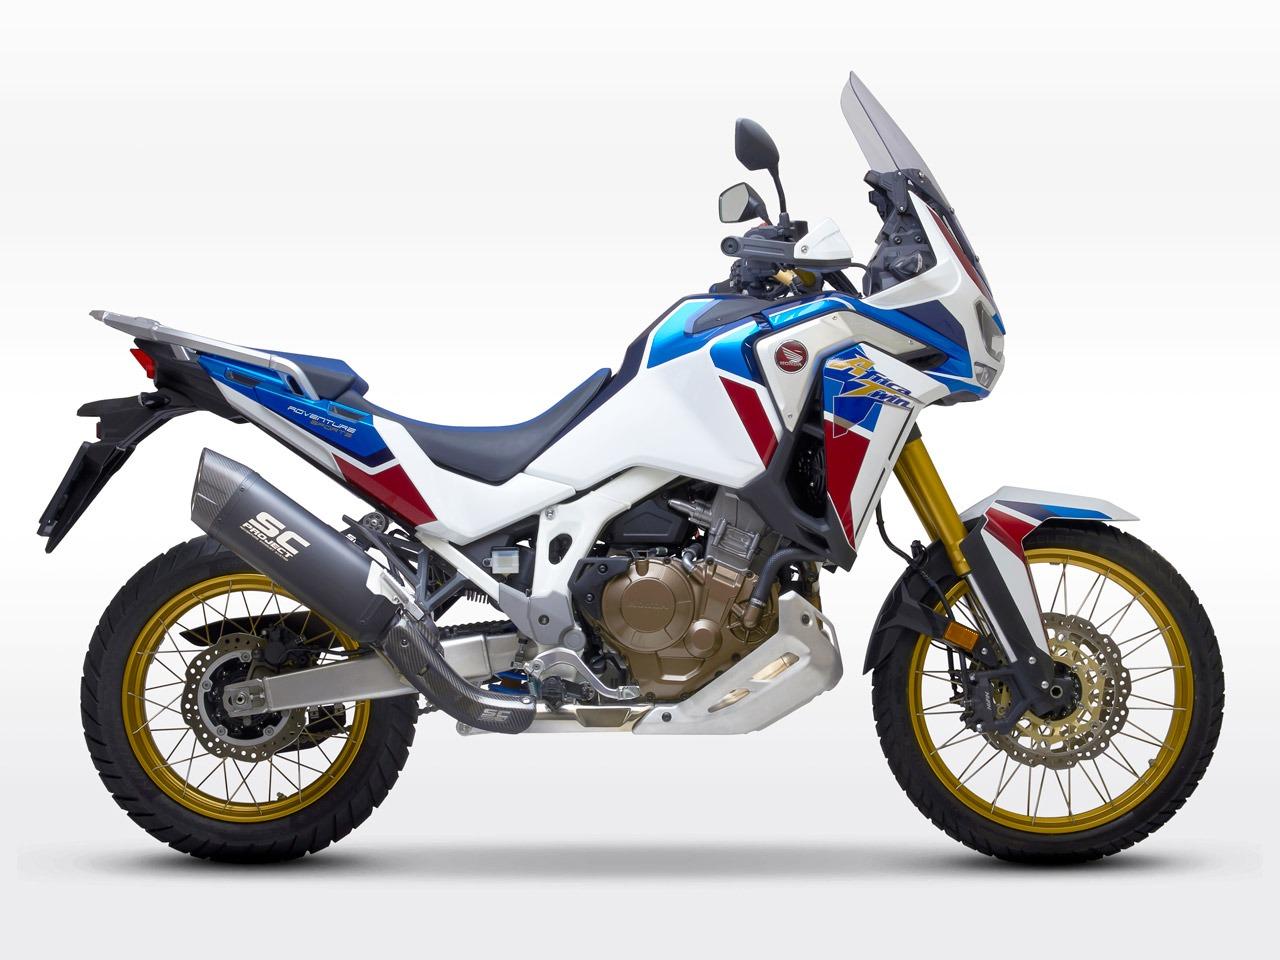 Honda_CRF1100L-AfricaTwin_my2021_Adventure-MattBlack_Lato_1280x960px_web-partnership